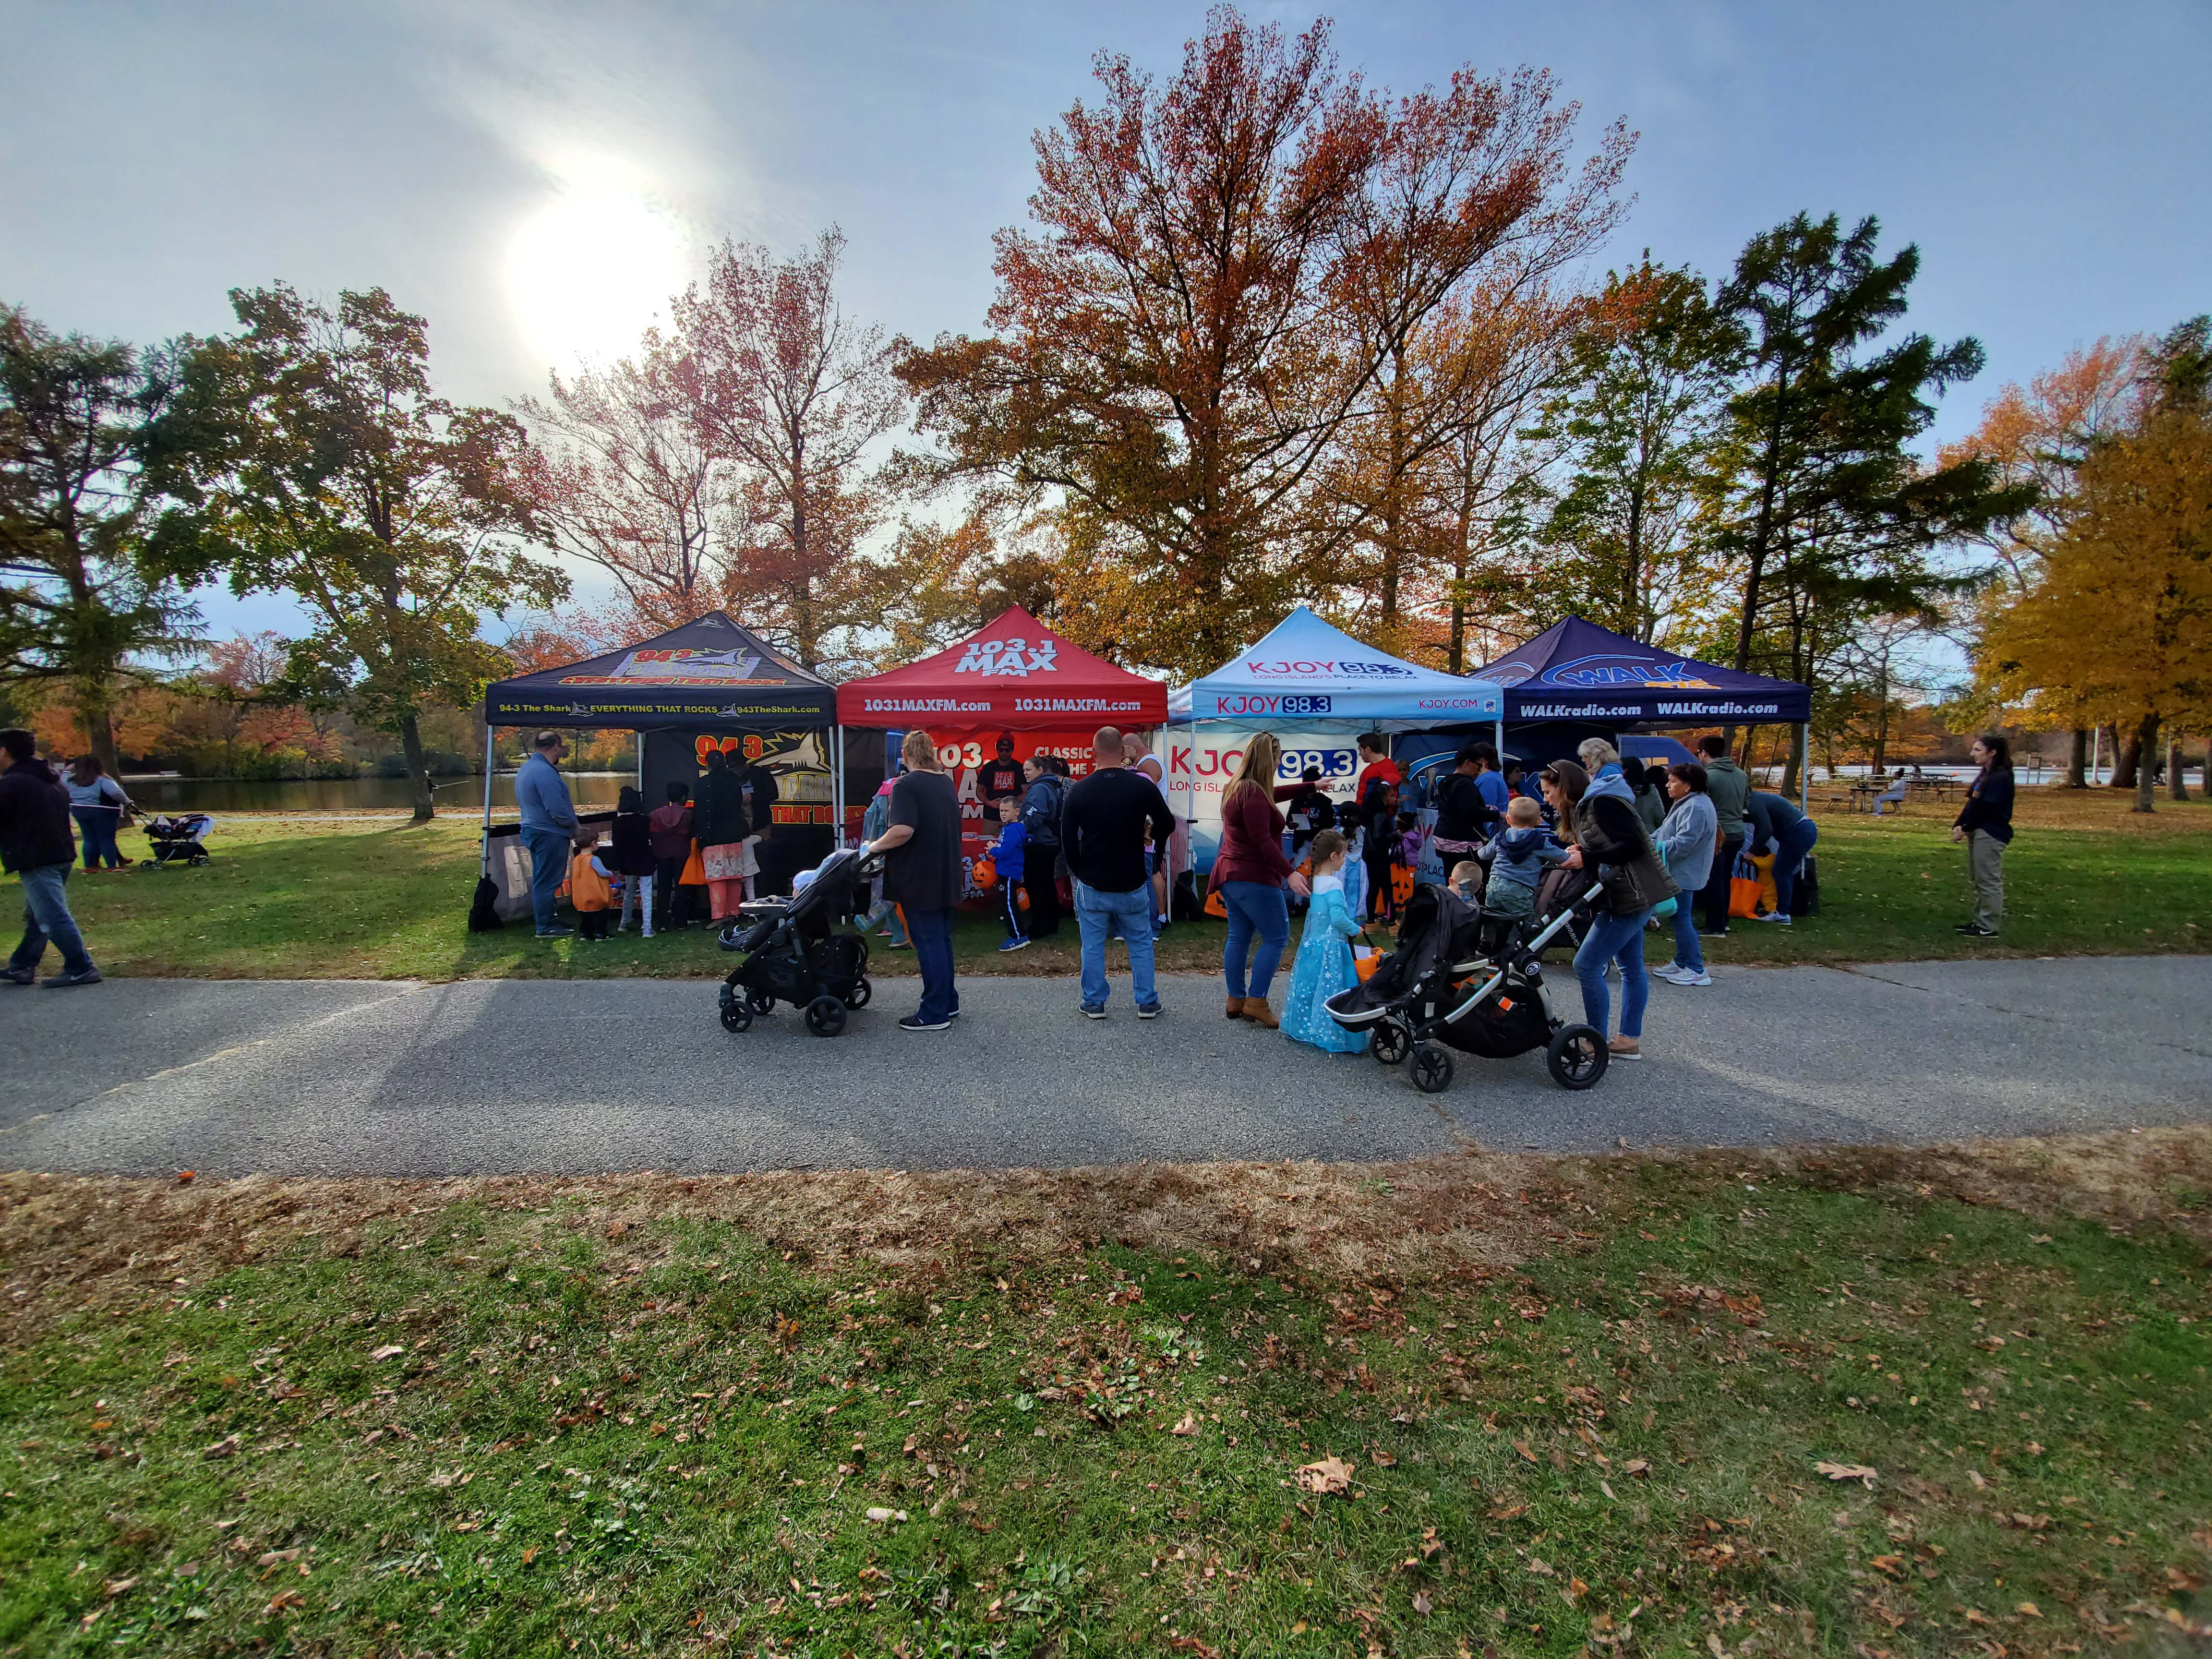 NYS Parks: The Great Jack-O-Lantern Sail